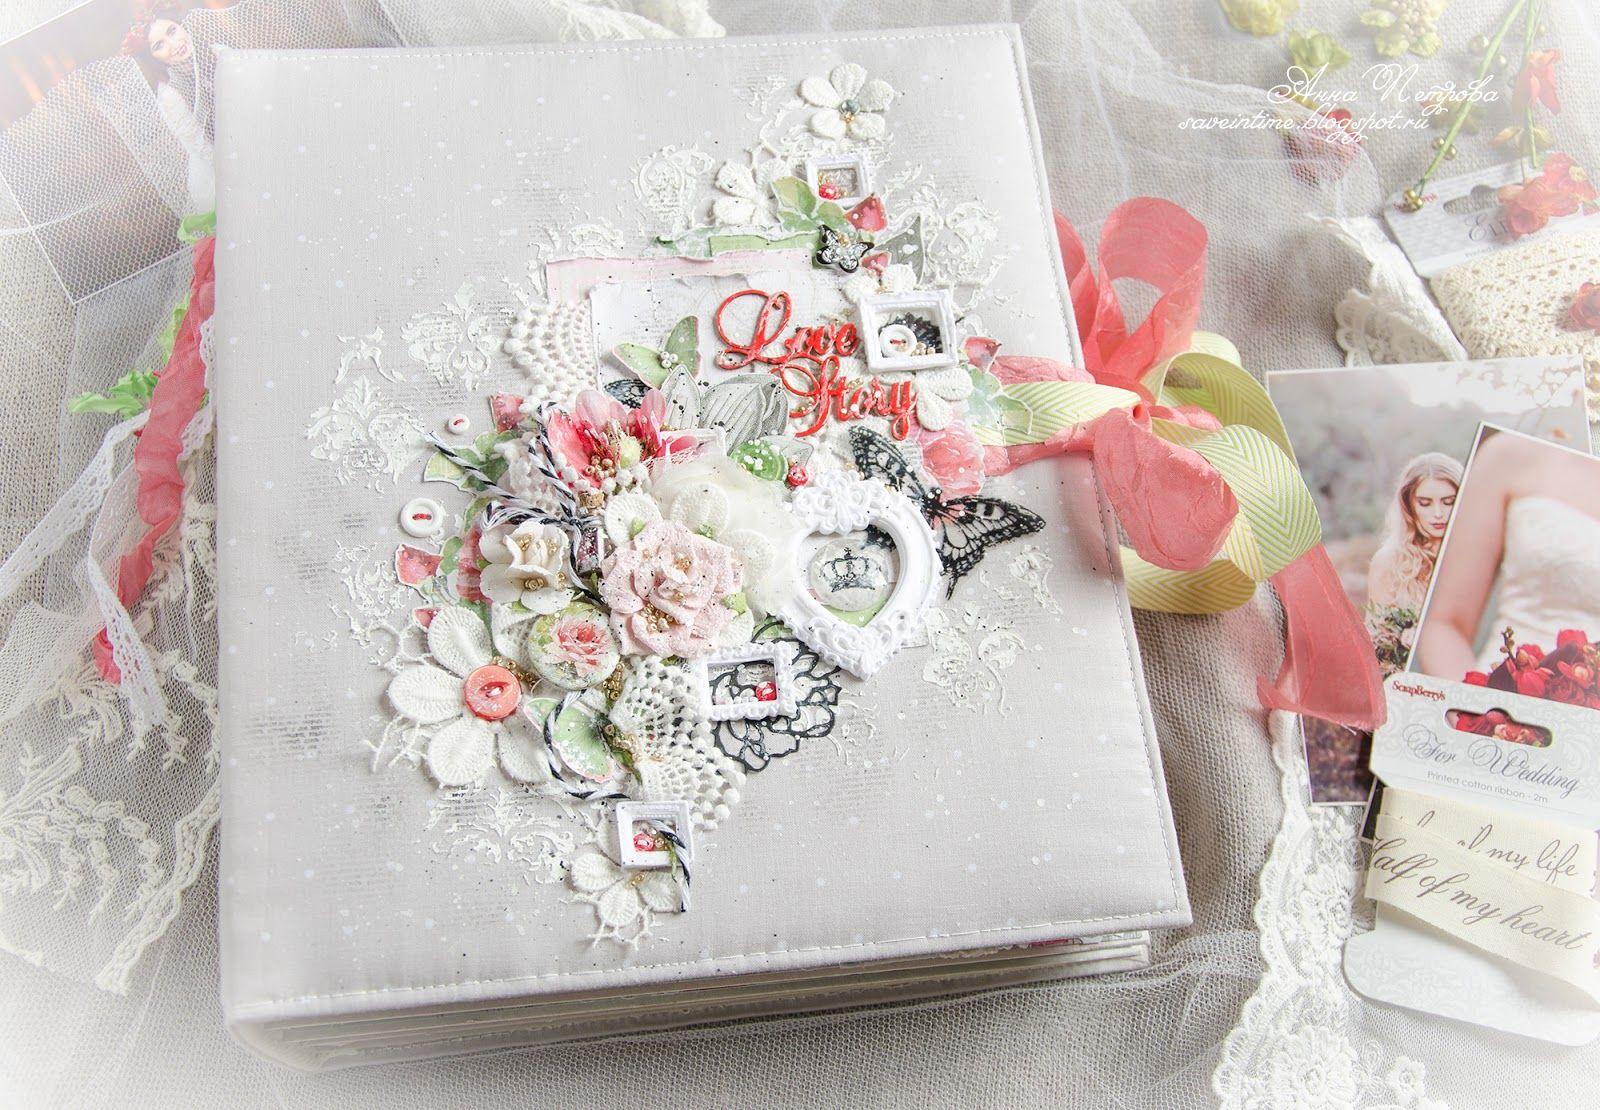 Картинки для свадебного альбома своими руками фото 608